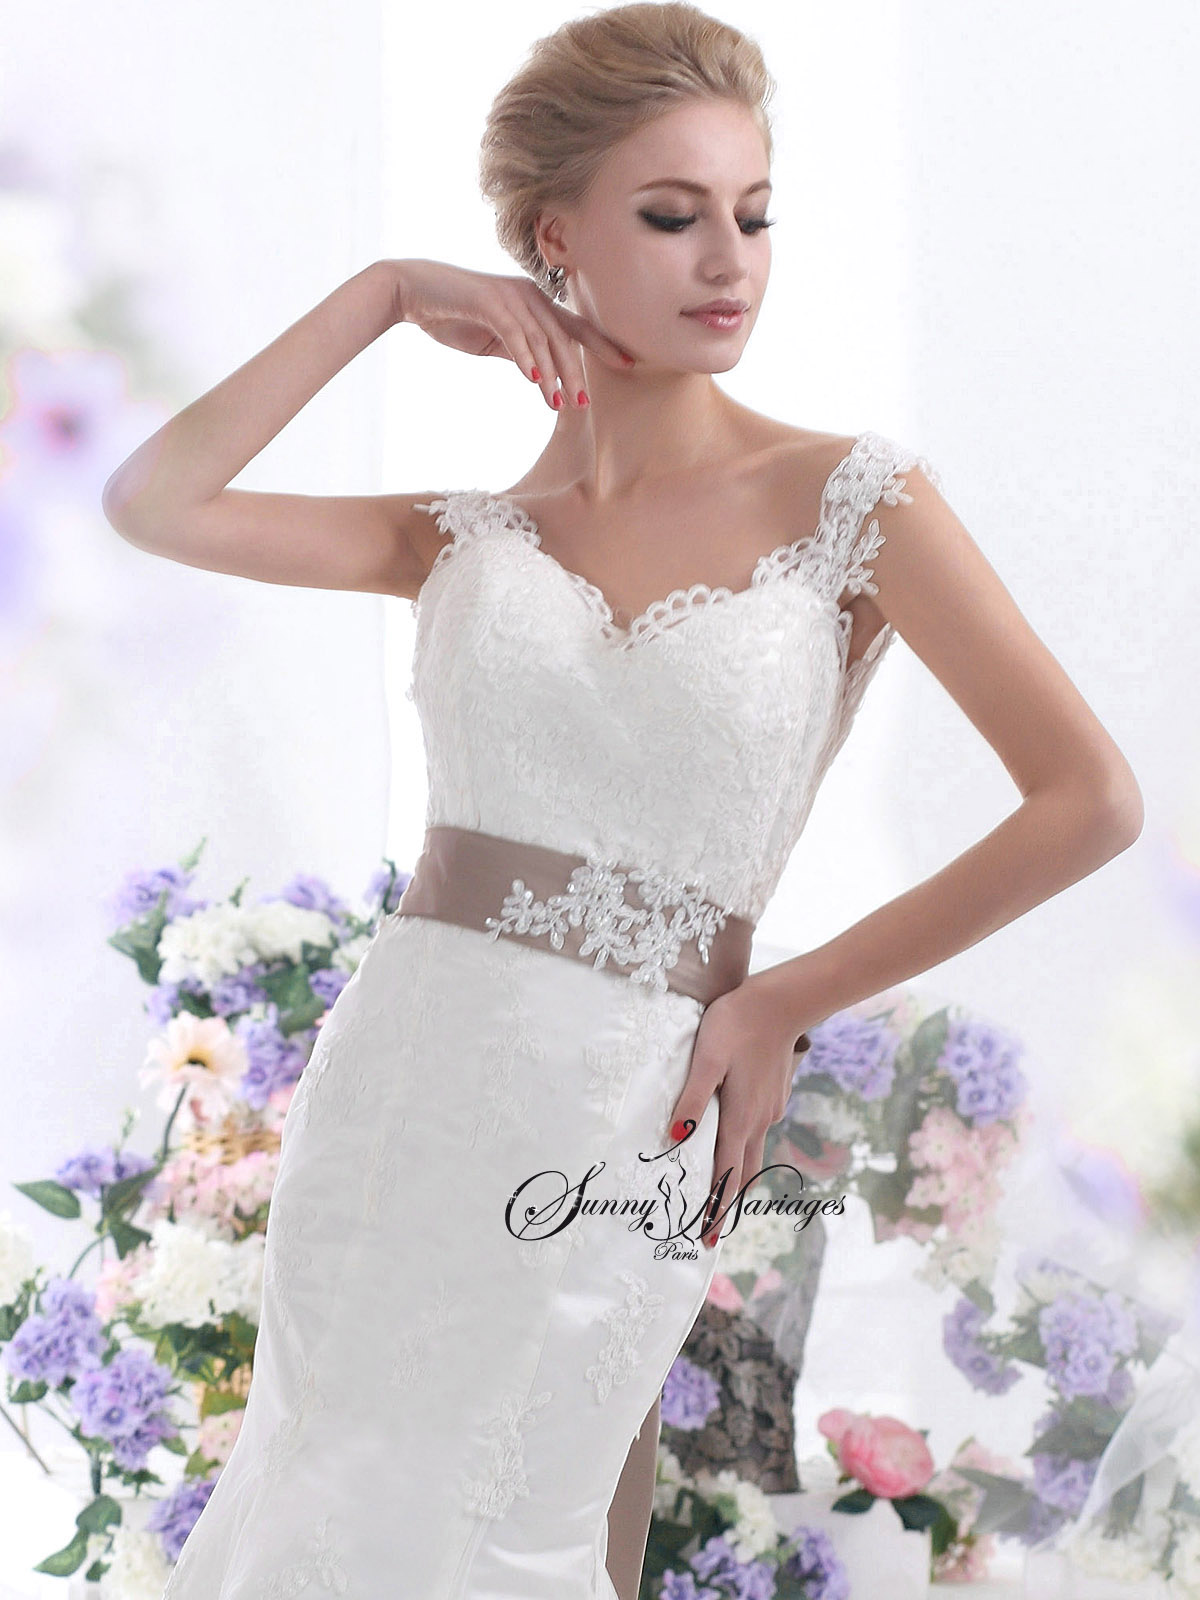 Robe de mariee en dentelle forme sir ne en vente en ligne for Nous robes de mariage en ligne